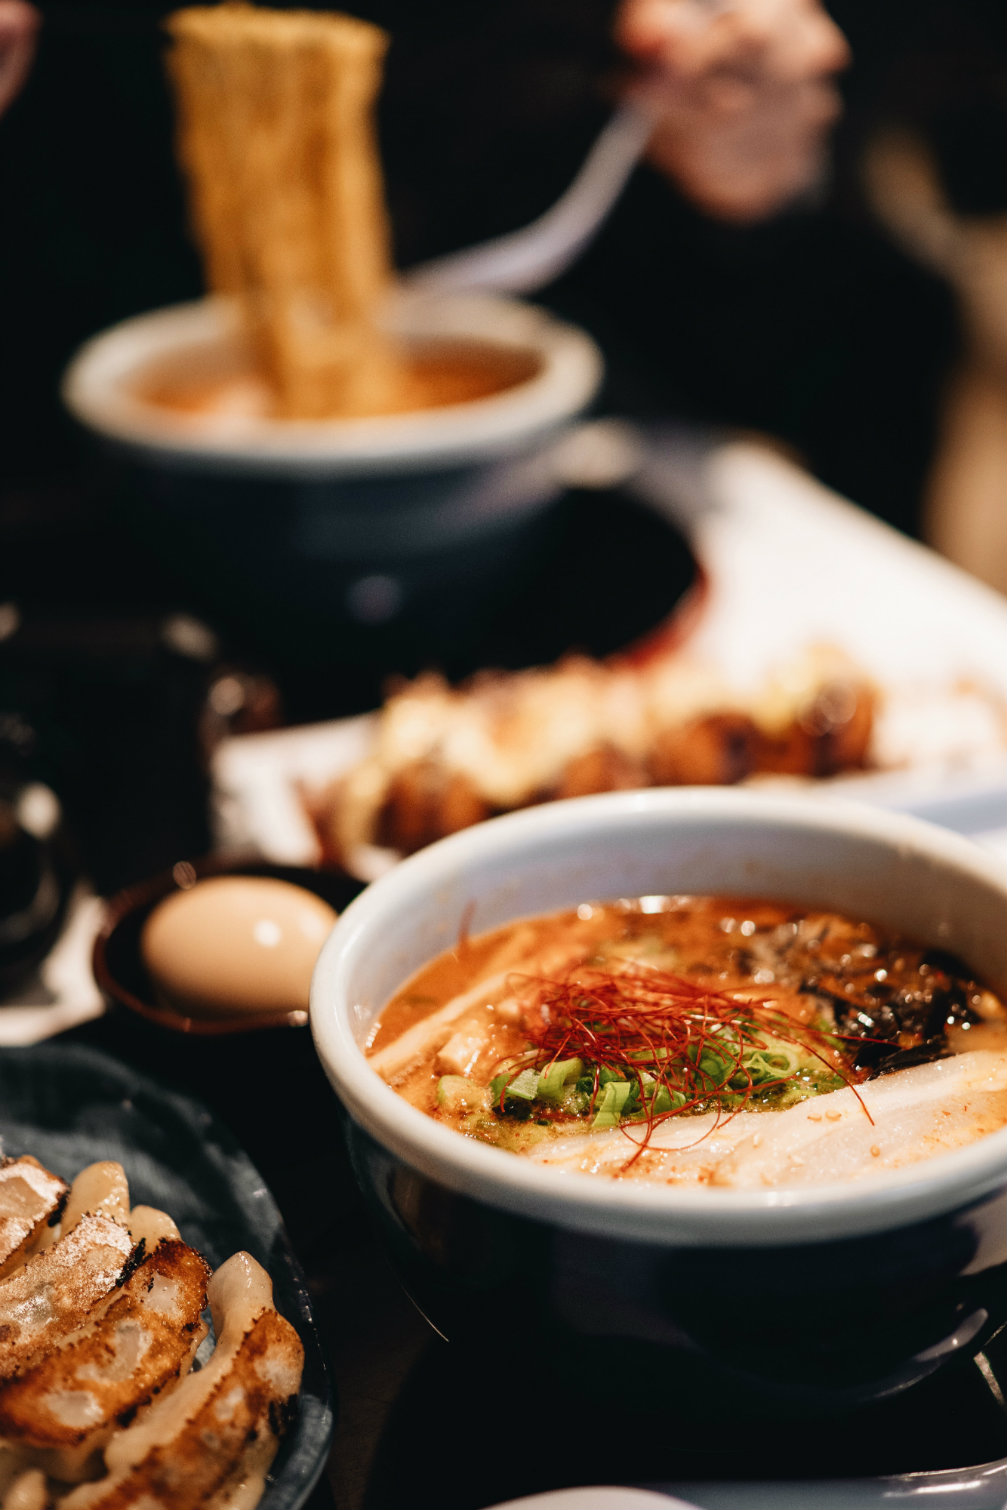 cucina-giapponese-piatti-italian-food-academy